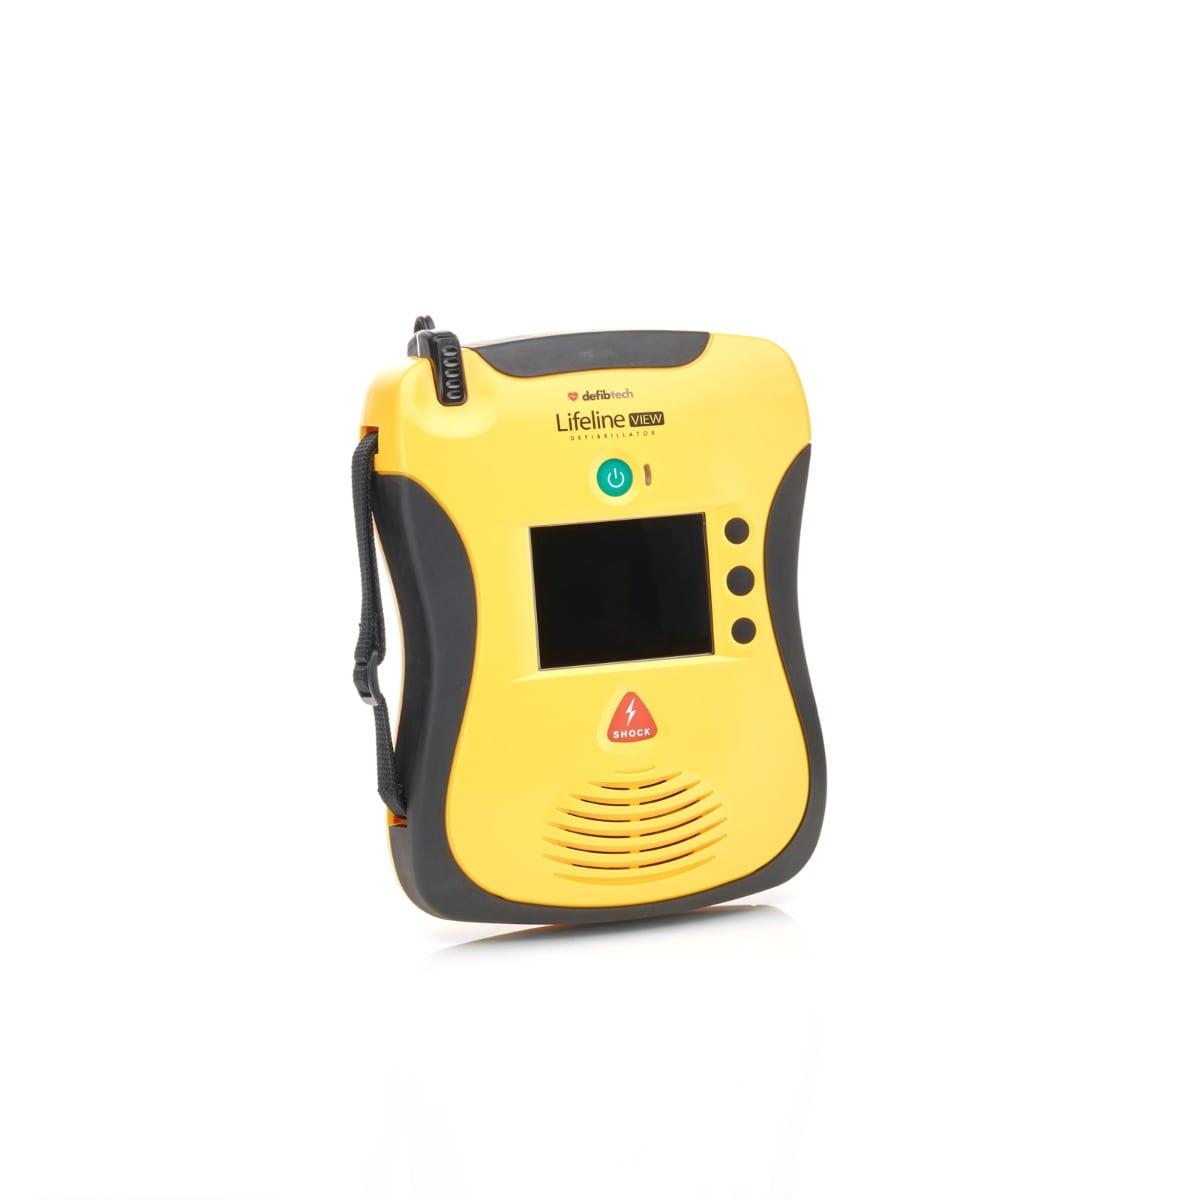 Defibtech Lifeline VIEW AED-Halfautomaat-Nederlands-Engels - Janhofman.nl - 1